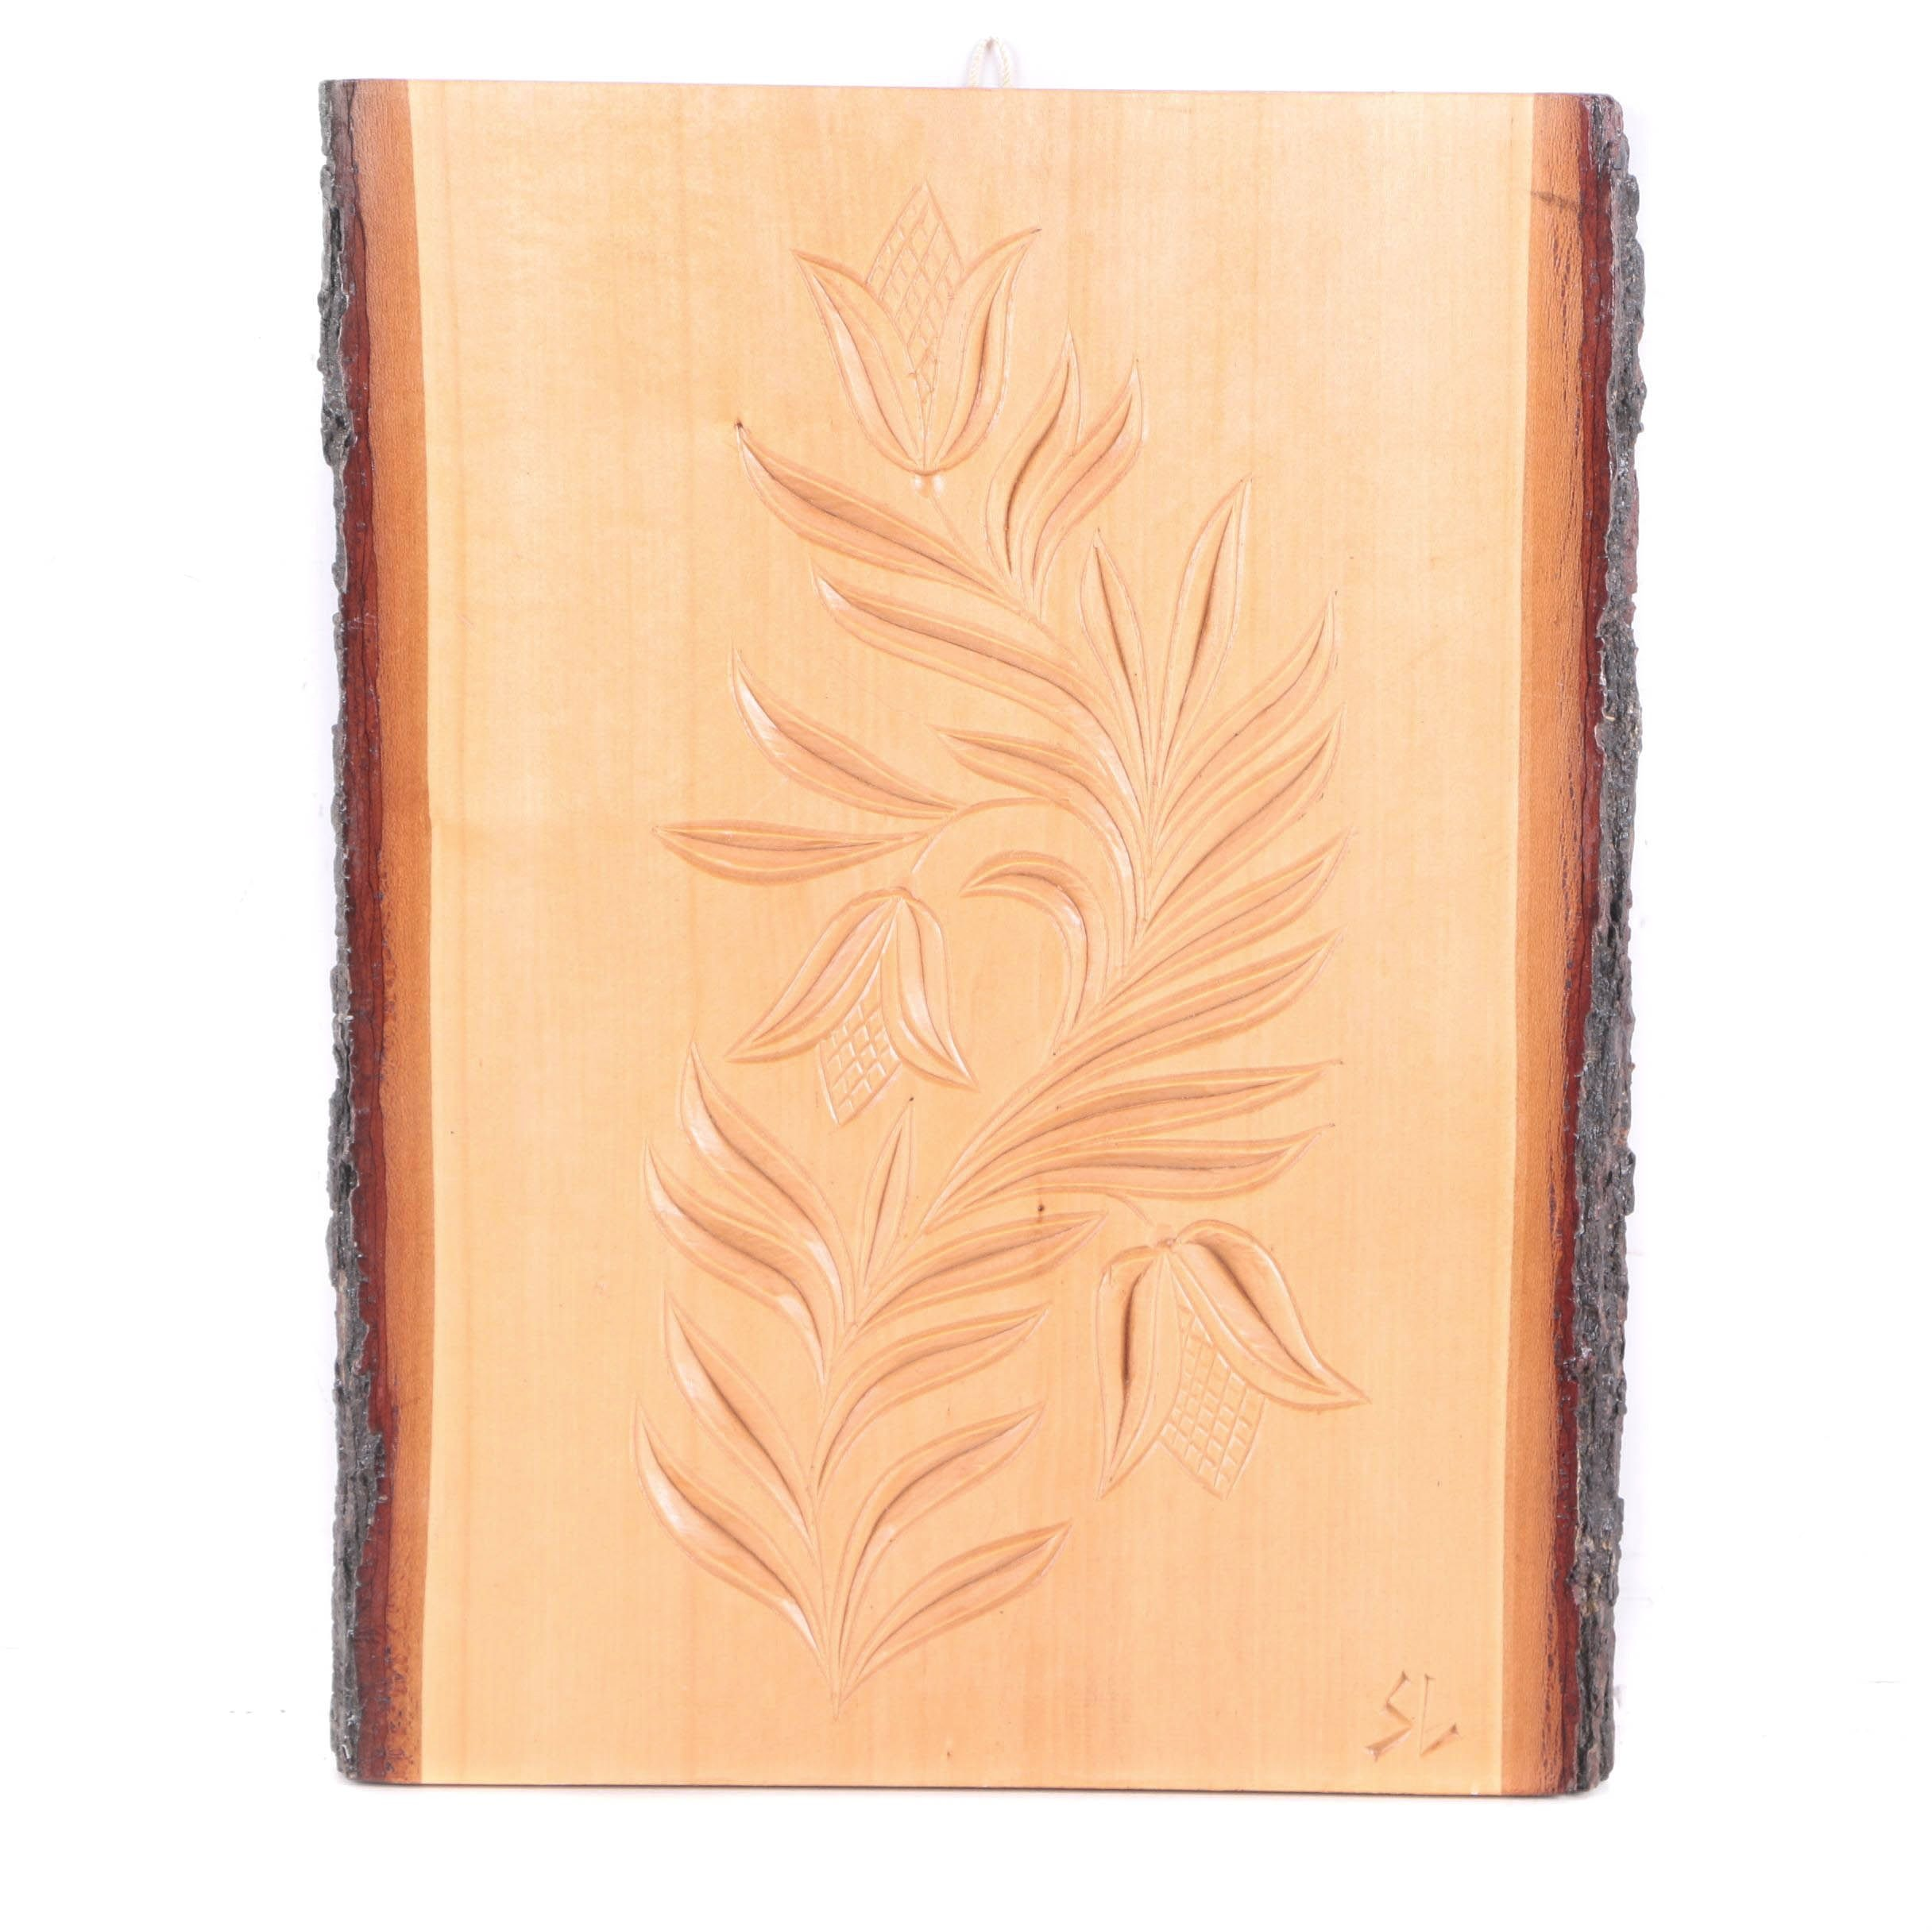 Székelyföld Woodcarving On Board